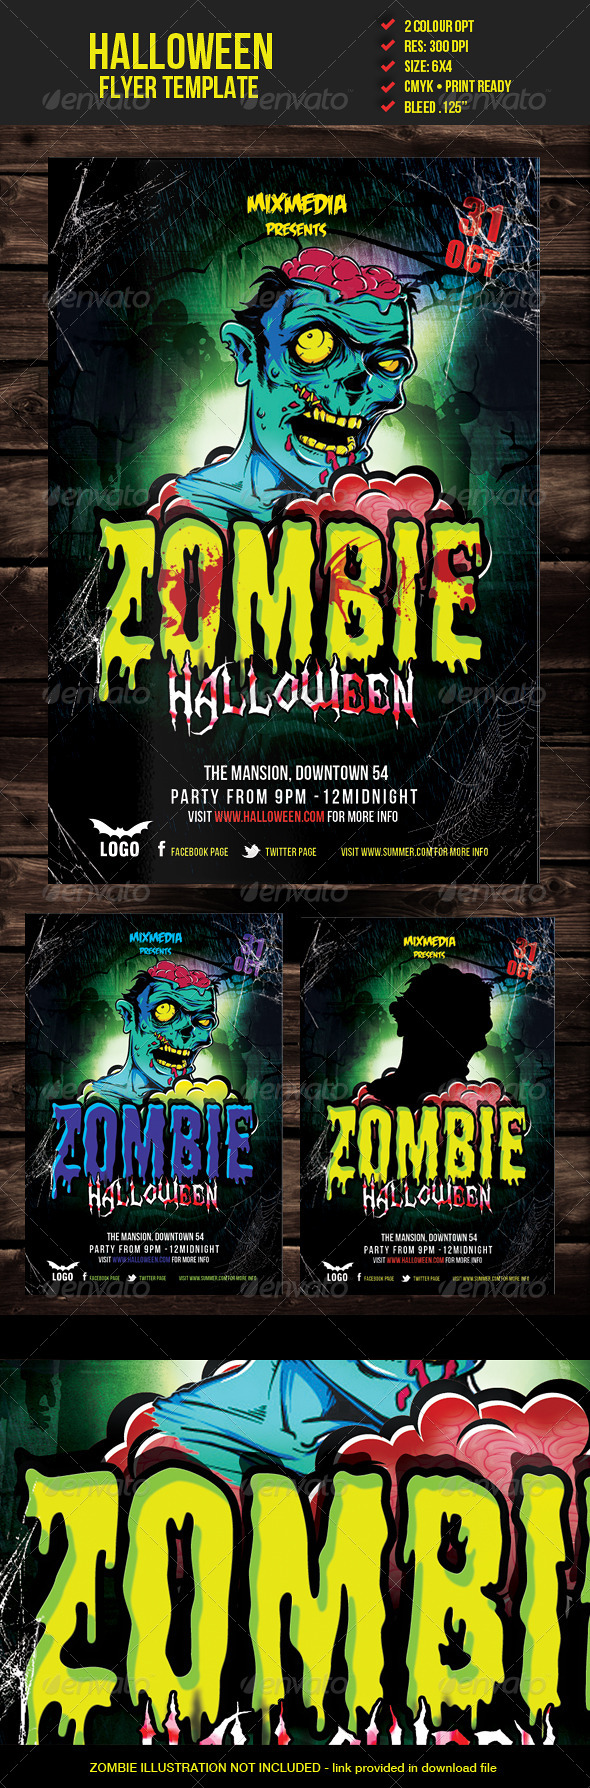 Zombie Halloween Flyer Template - Events Flyers